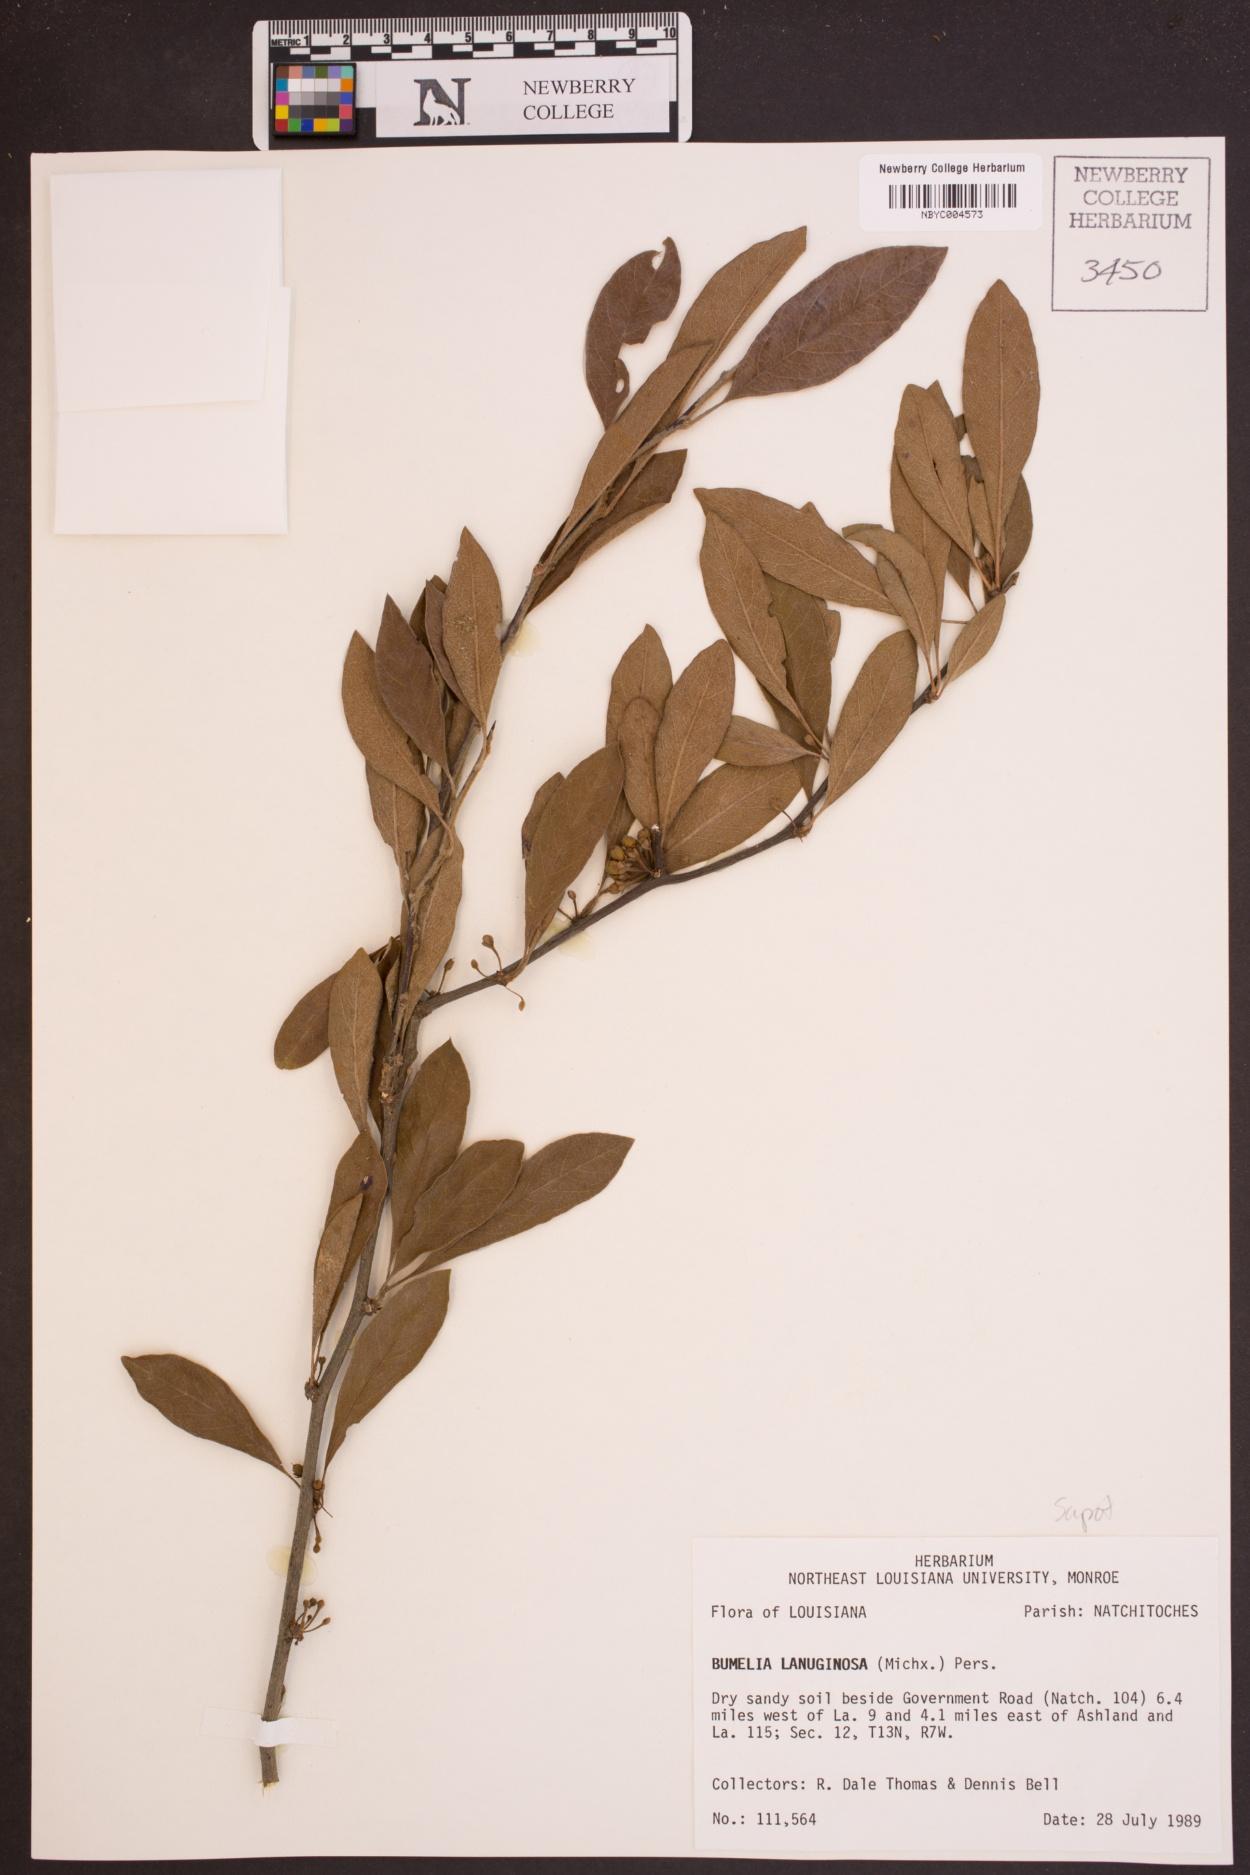 Bumelia lanuginosa image